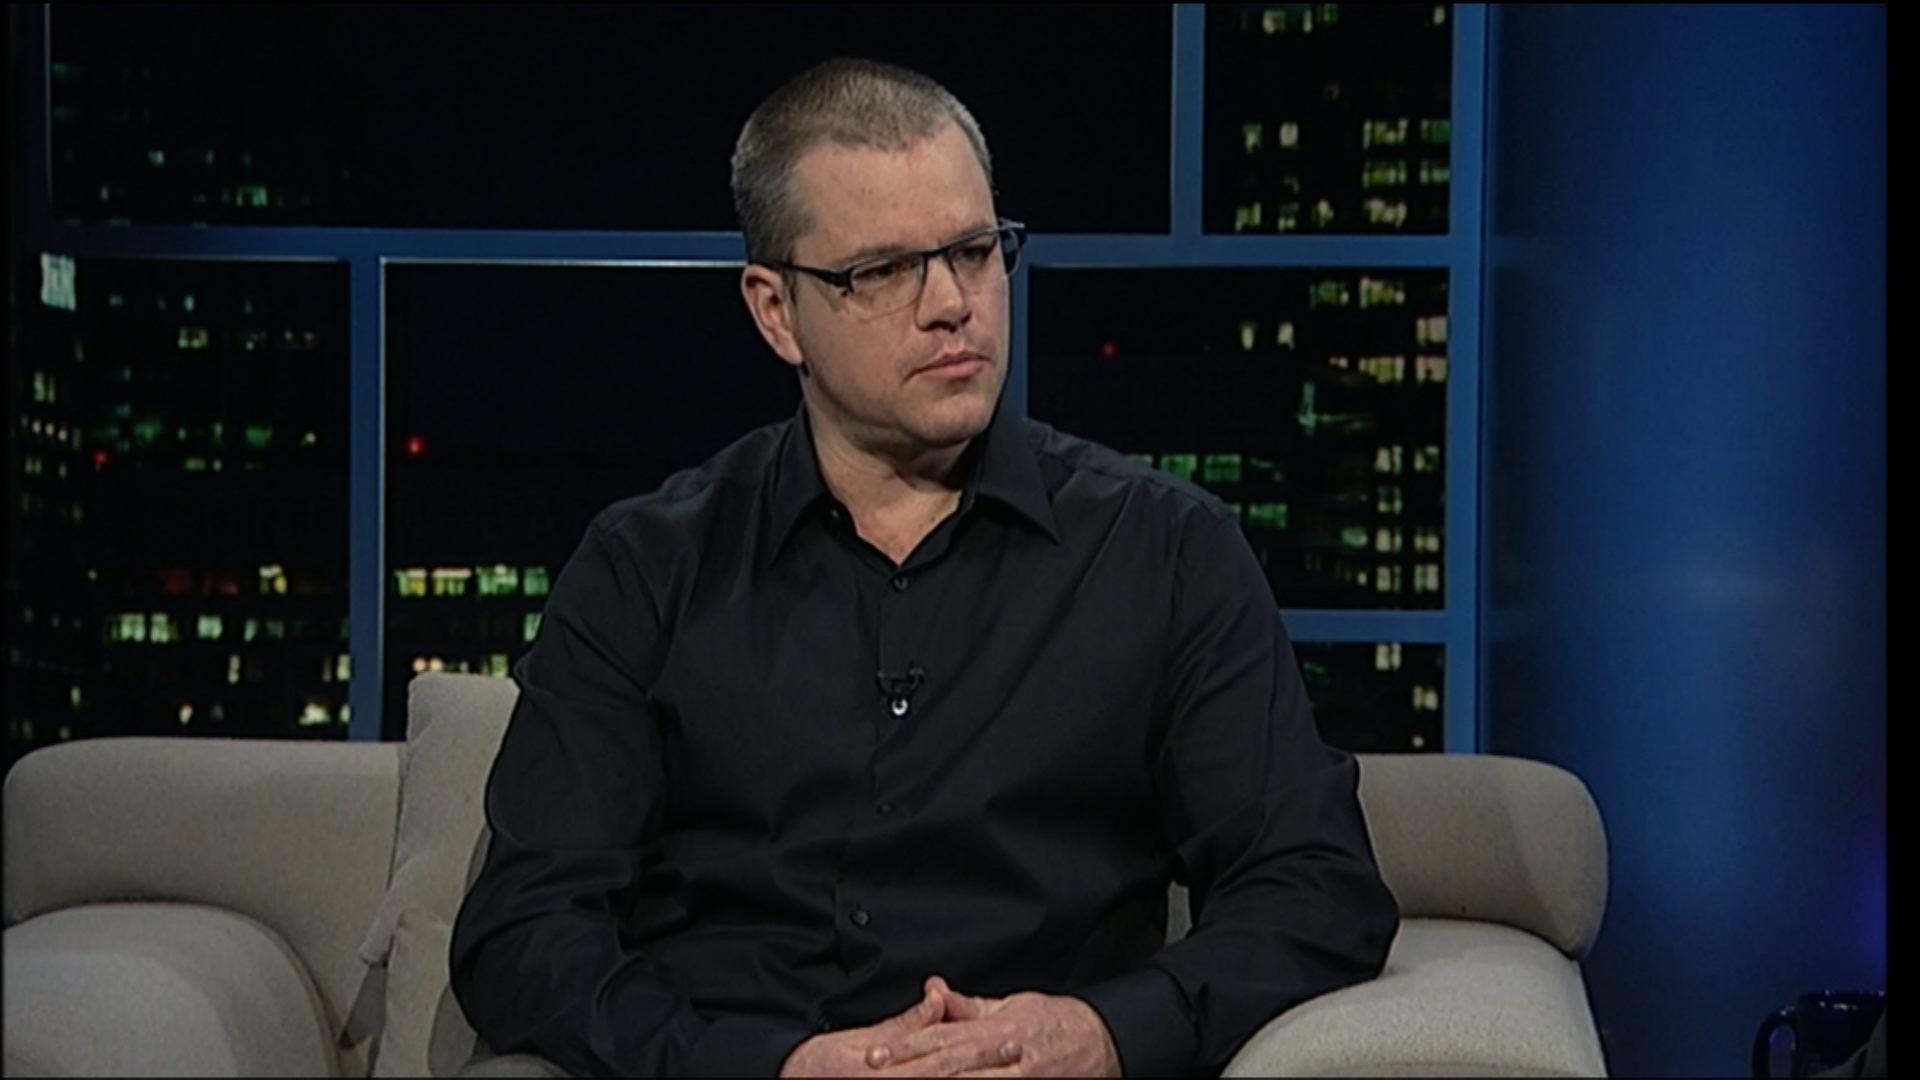 Actor-writer-producer Matt Damon, Part 2 image